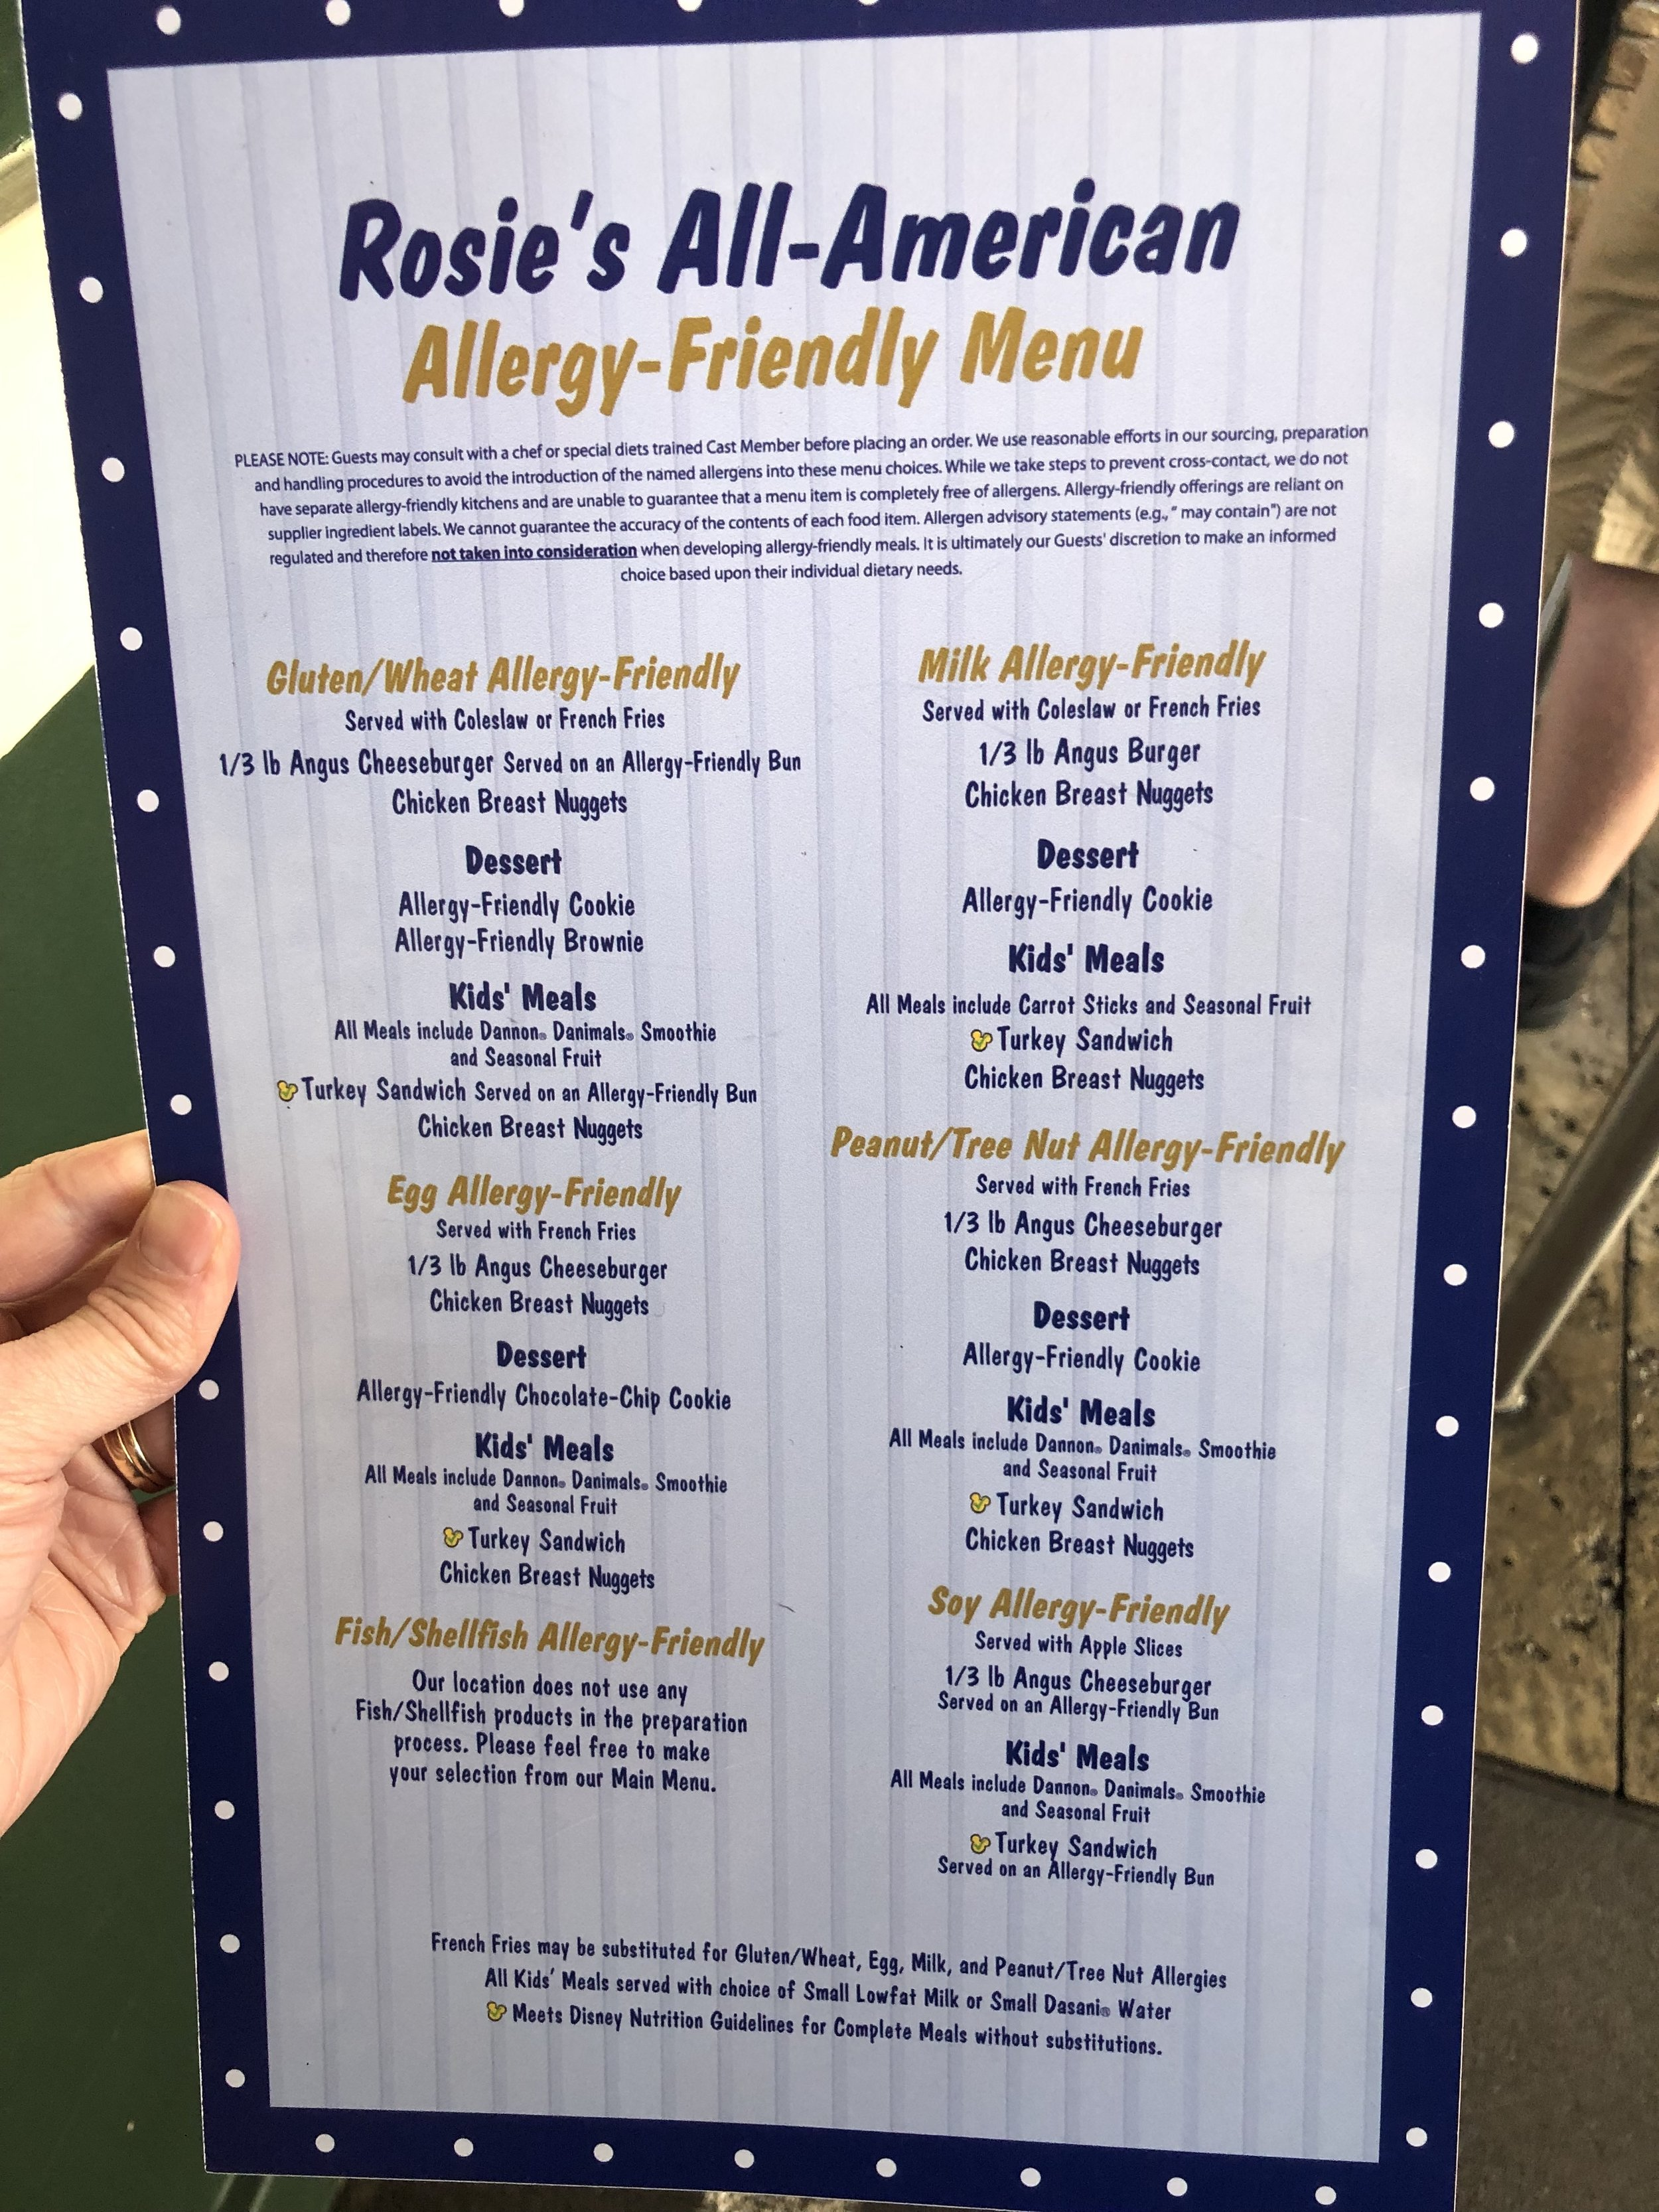 Rosie's All American Diner Allergy Menu (Near Rockin' Rollar Coaster) - Hollywood Studios